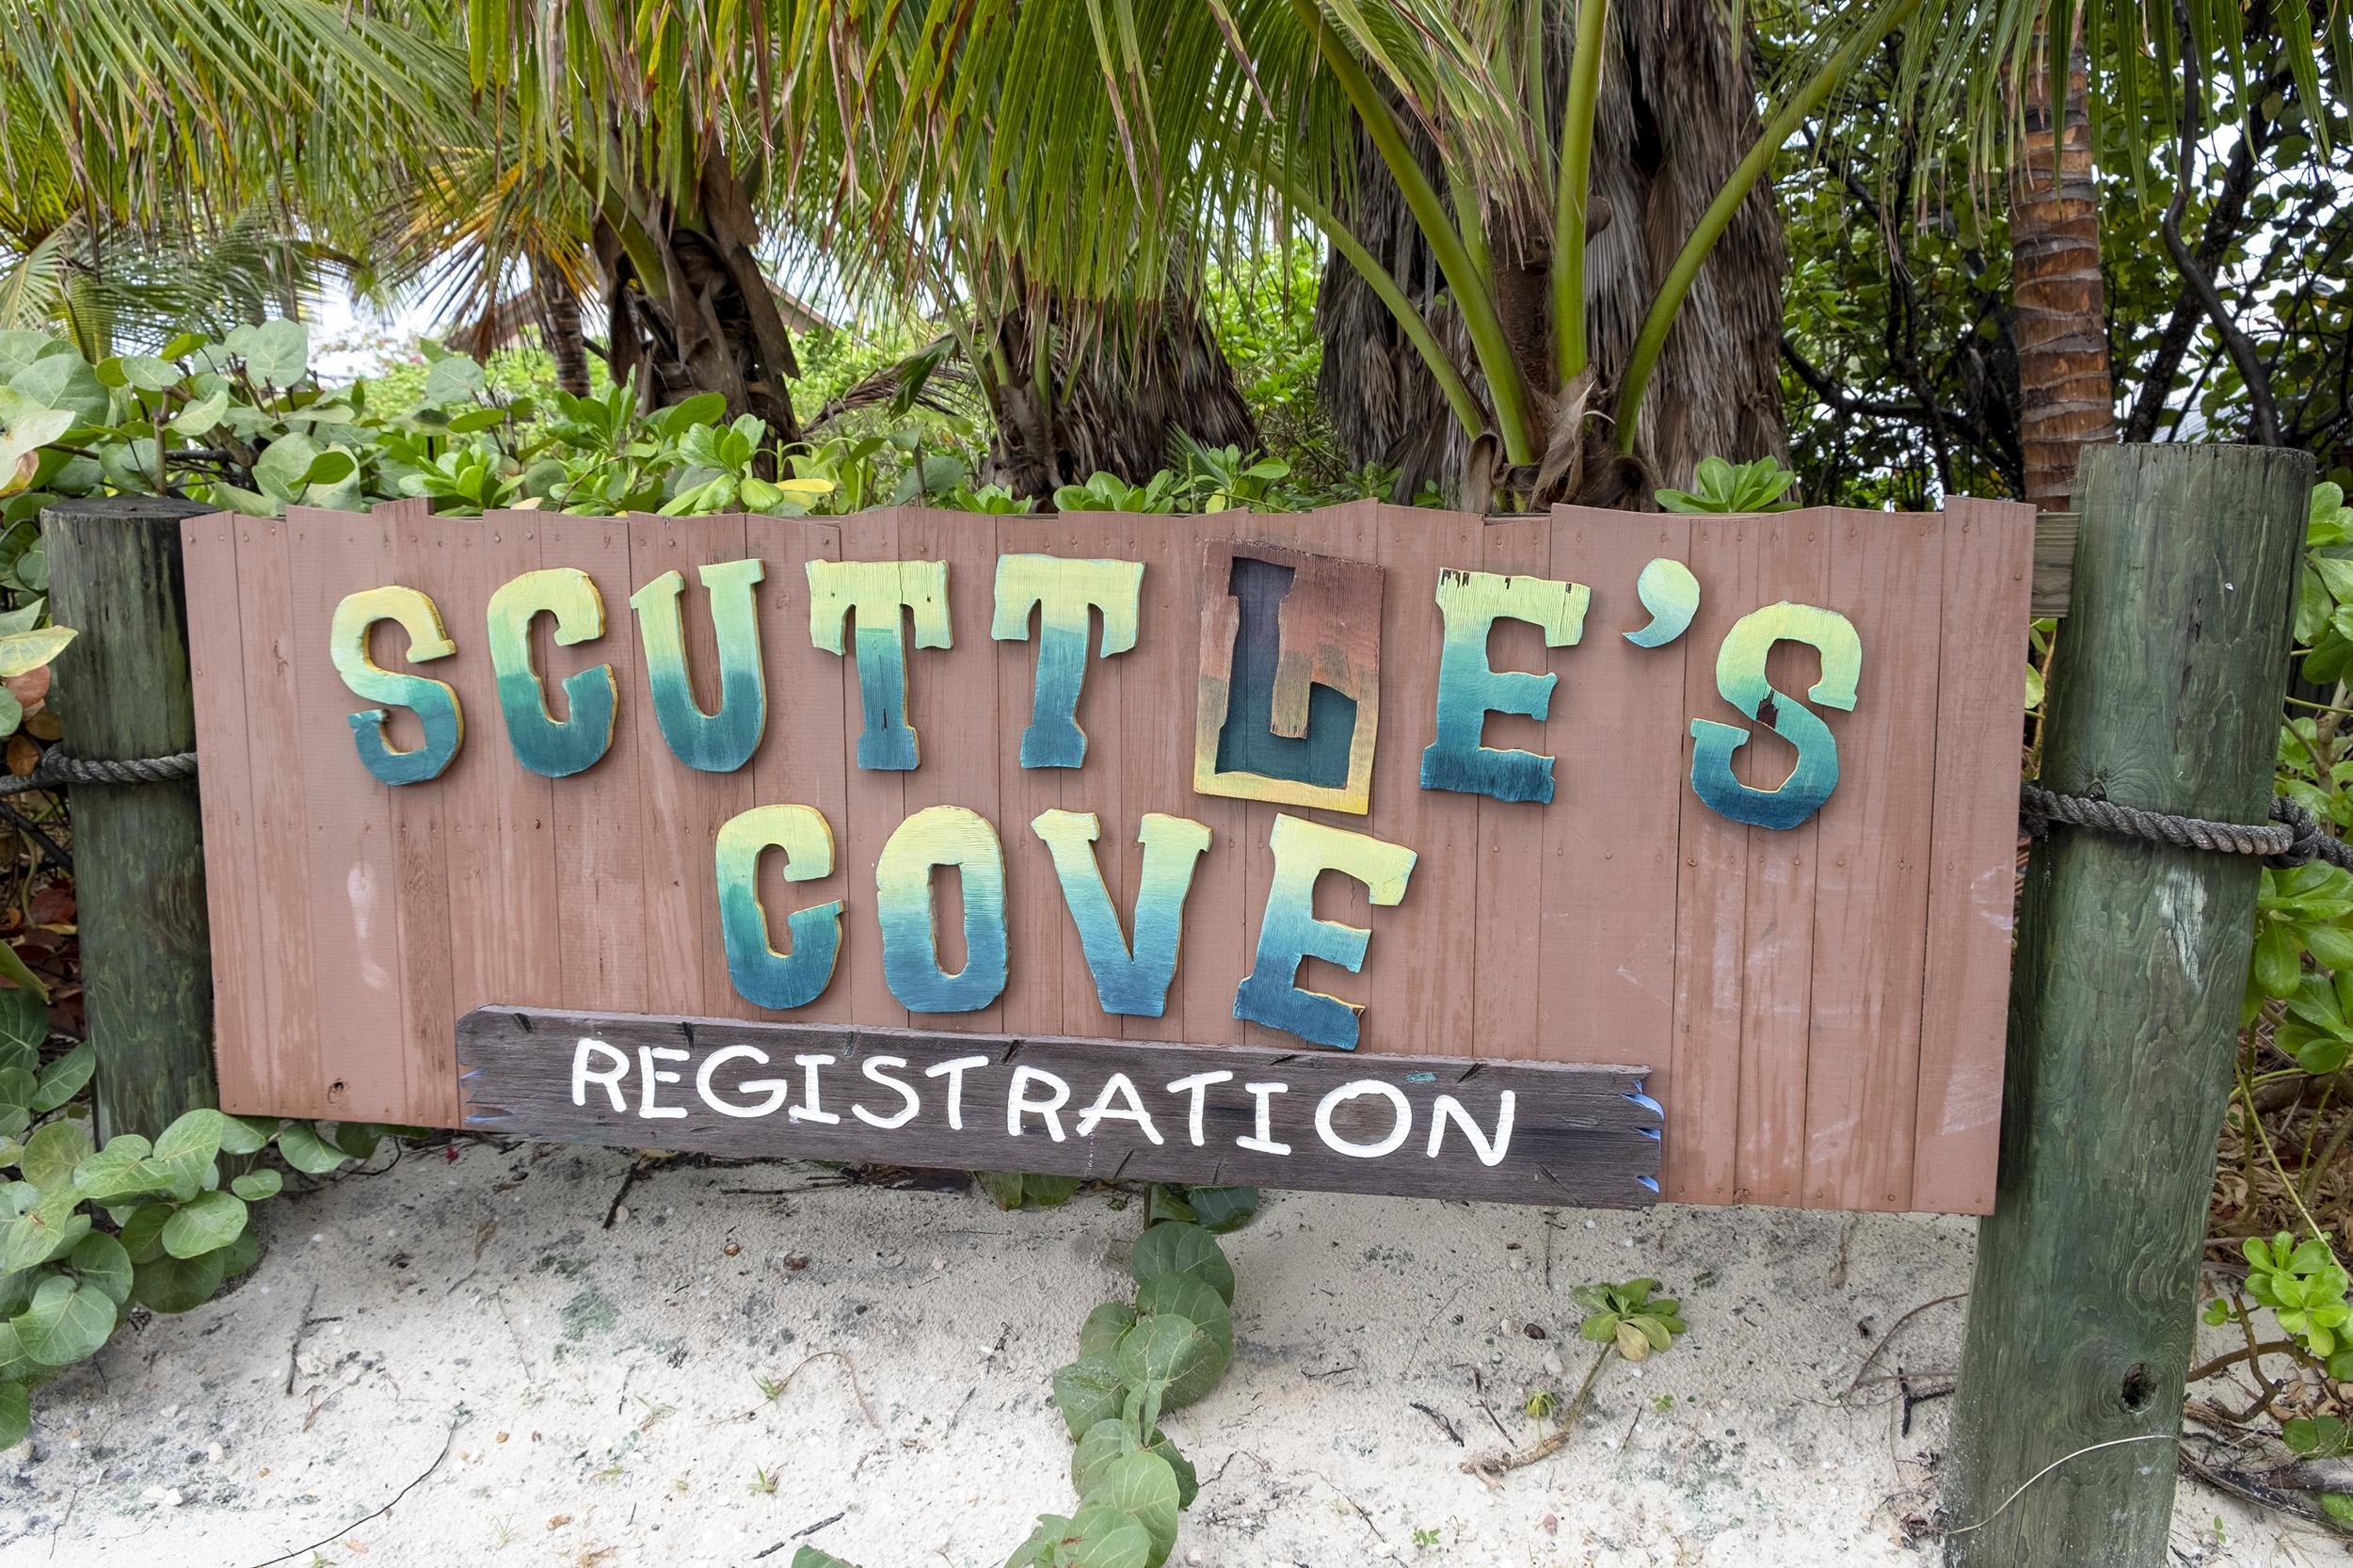 Scuttles Cove Castaway Cay